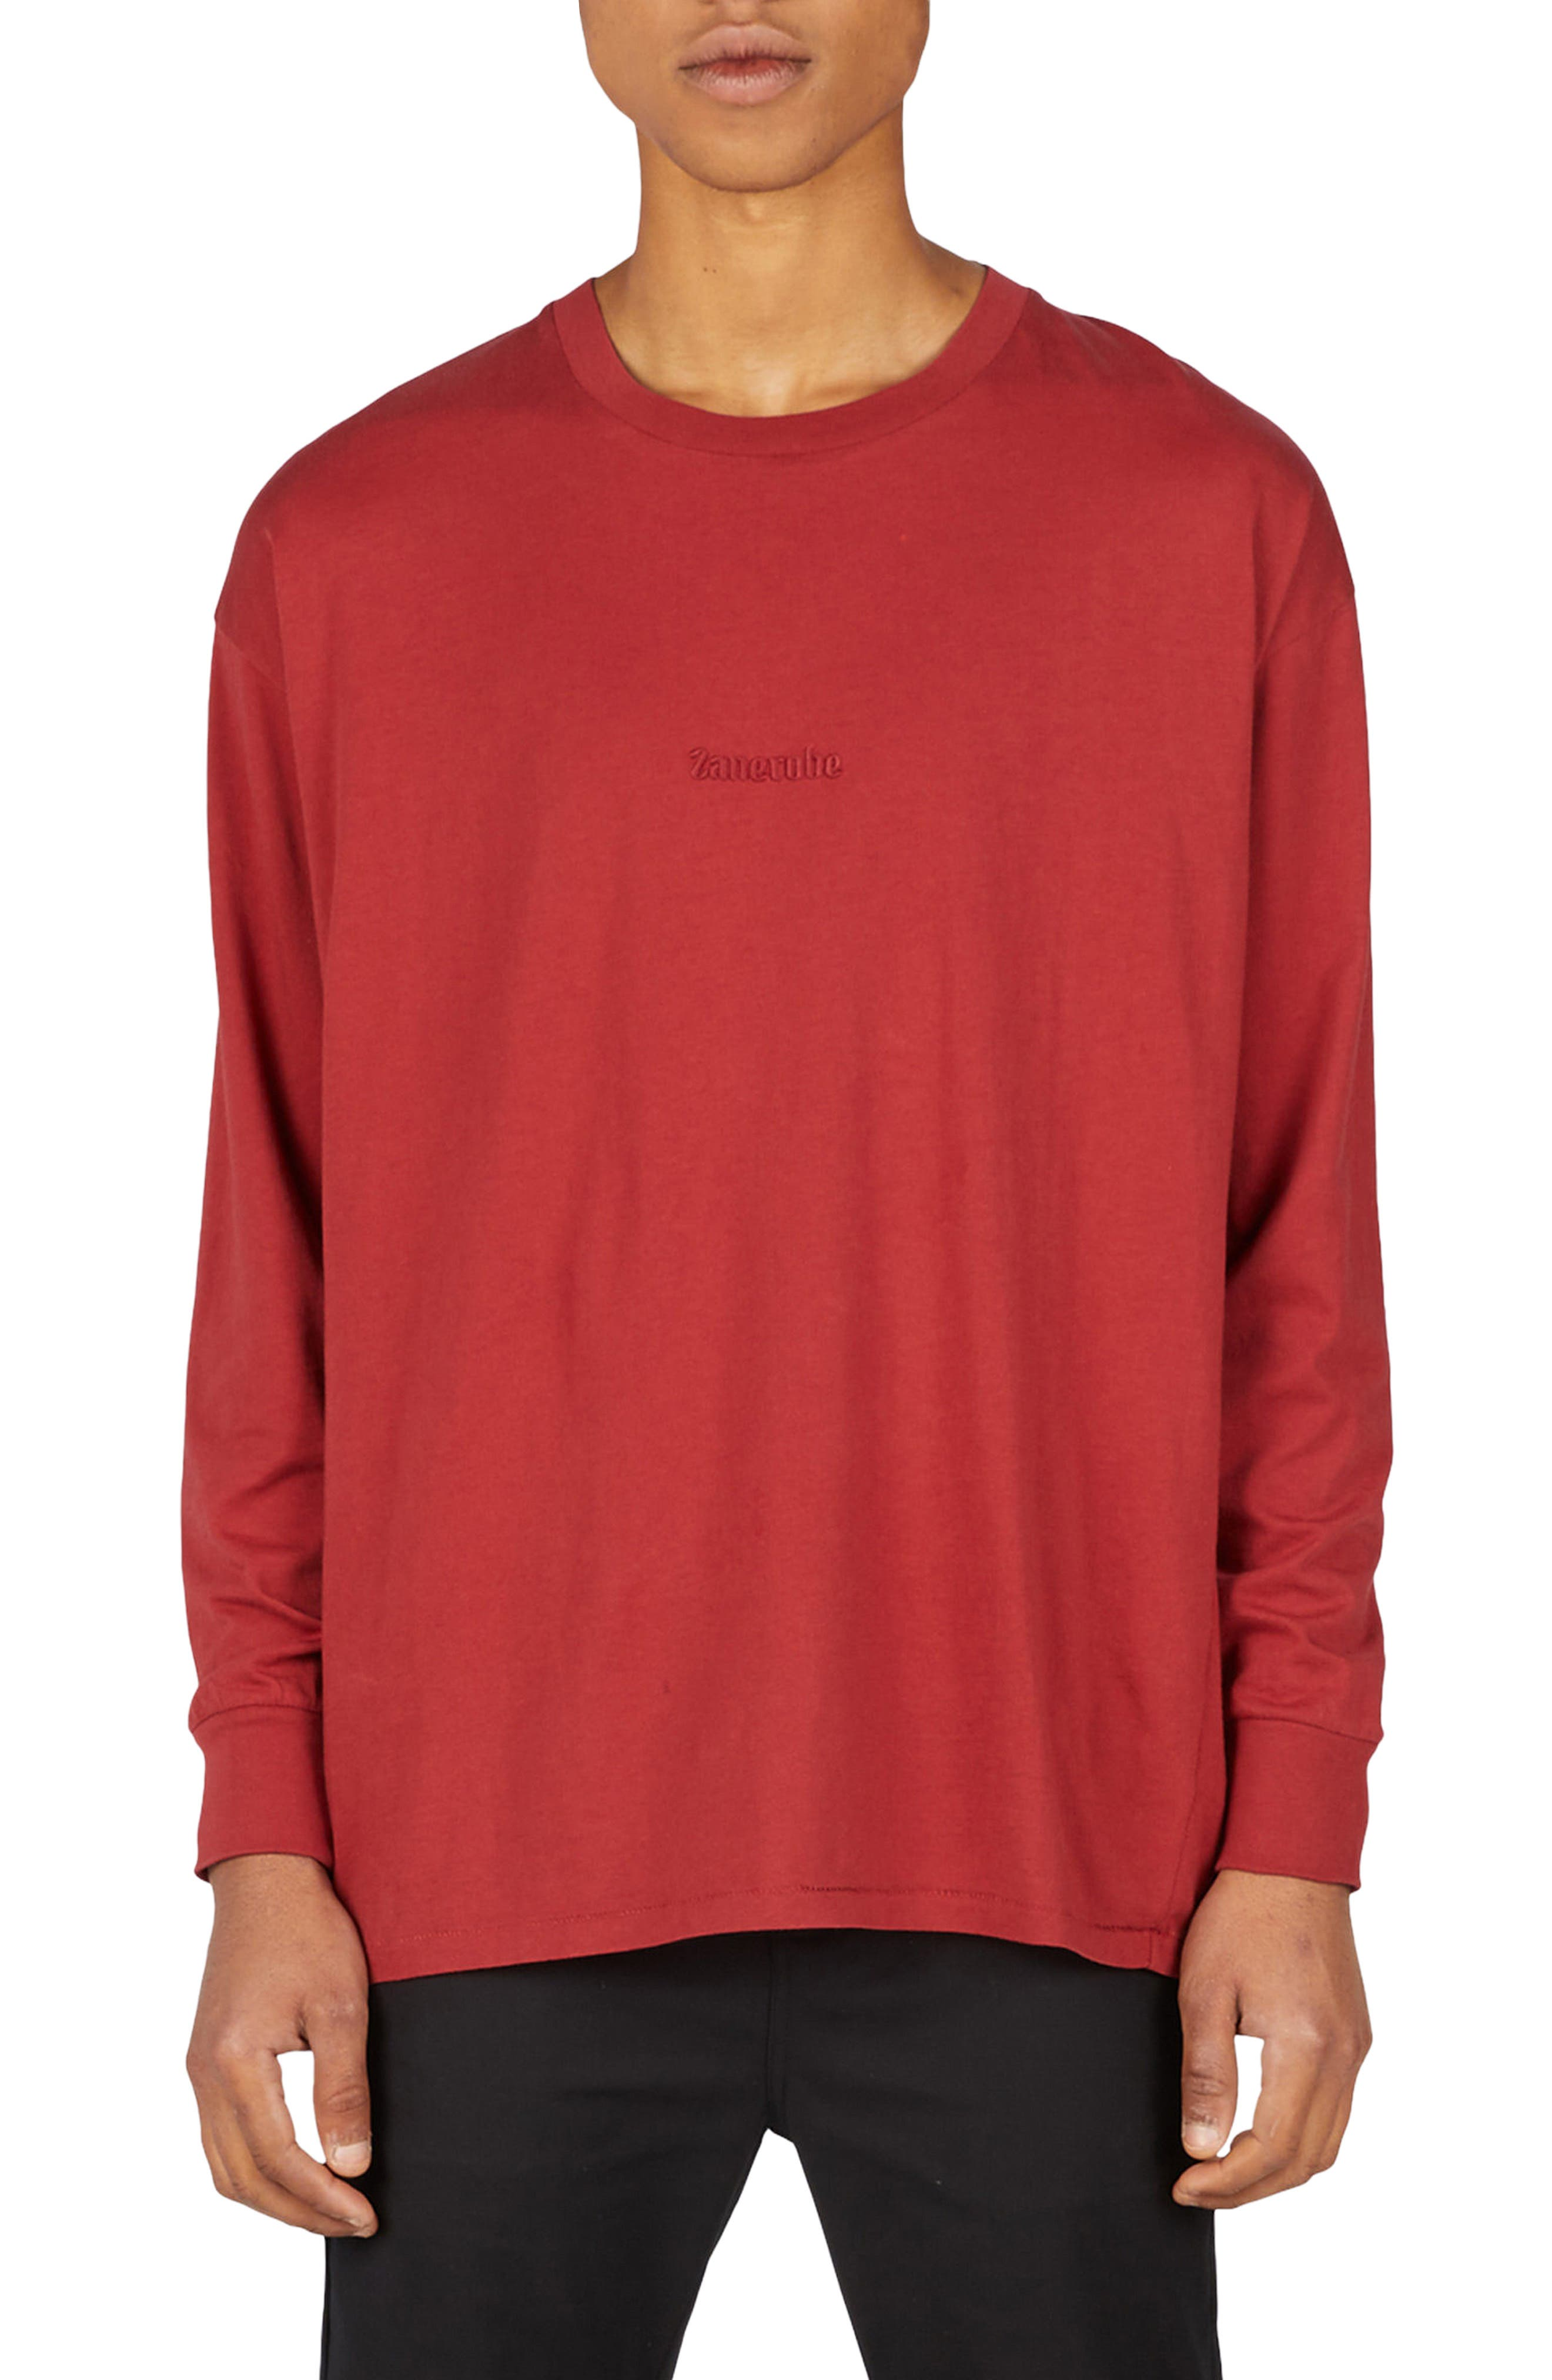 Sponsor Rugger T-Shirt,                             Main thumbnail 1, color,                             601